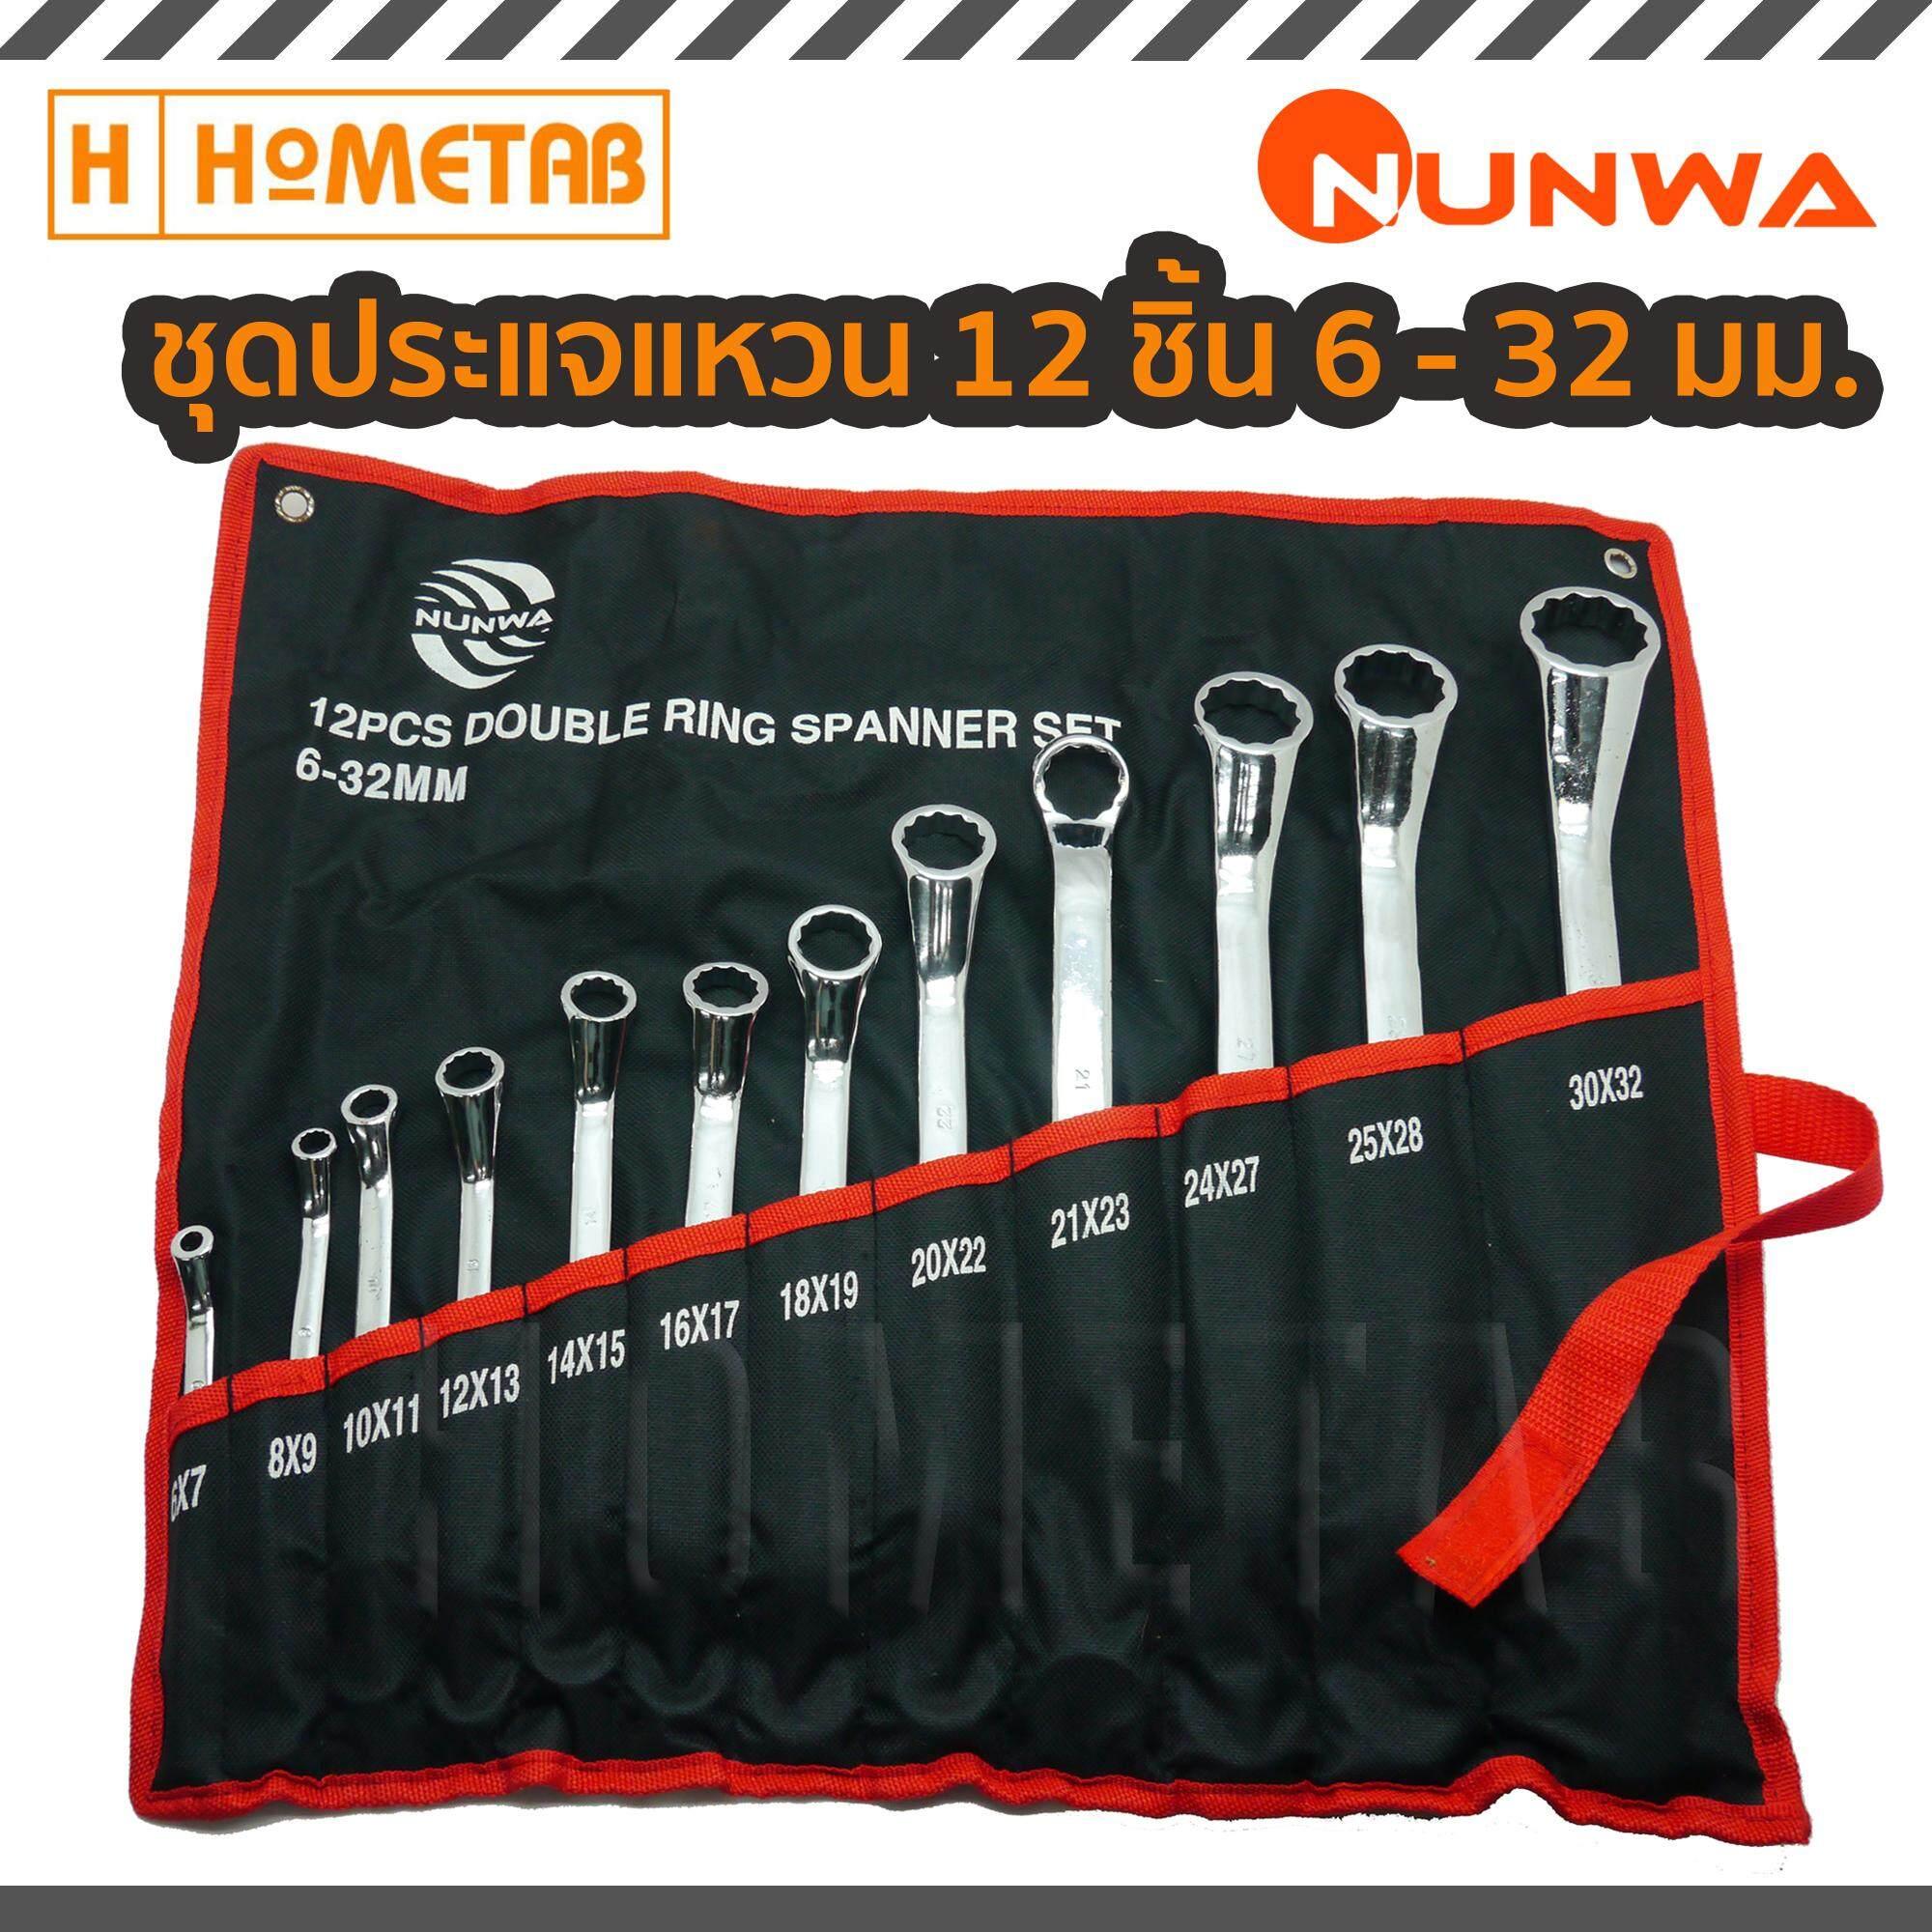 Nunwa ชุดประแจ ประแจ ประแจแหวน 12 ตัว 6-32 มม เครื่องมือช่าง ประแจบล็อก ประแจแหวน ประแจหกเหลี่ยม ประแจทอร์ค ประแจรวม ประแจตัวที ประแจดาว ประแจกากบาท ประแจปอนด์ ประแจคอม้า ประแจชุด ประแจจับท่อ ประแจคี 12 Pcs Combination Spanner Set Wrench 6-32 Mm..